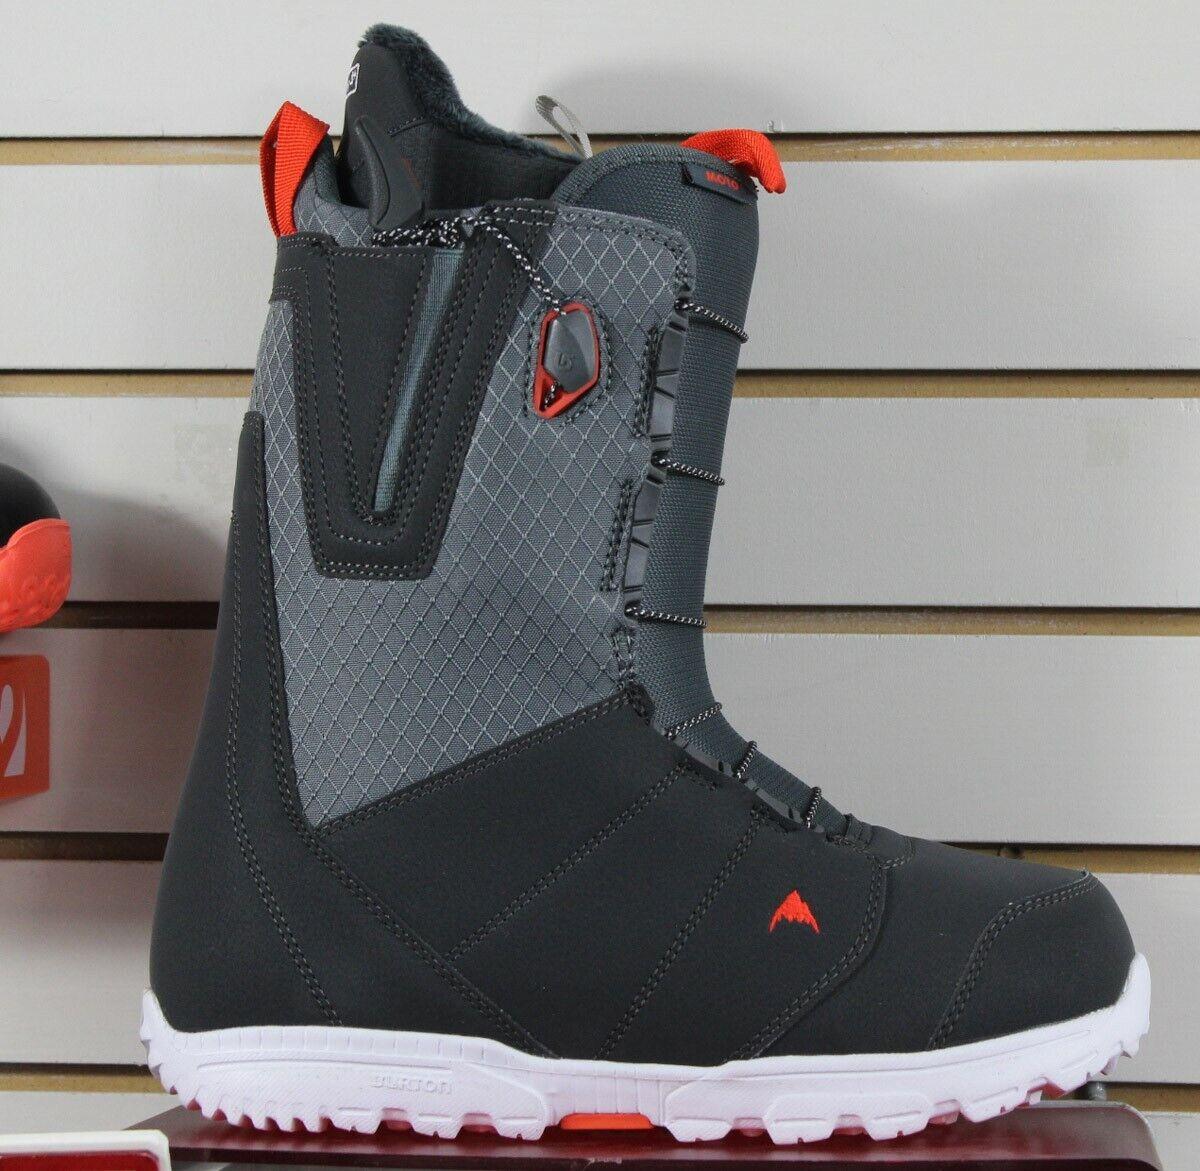 Burton Moto Snowboard Boots Mens Size 13 Grey / Red New 2020